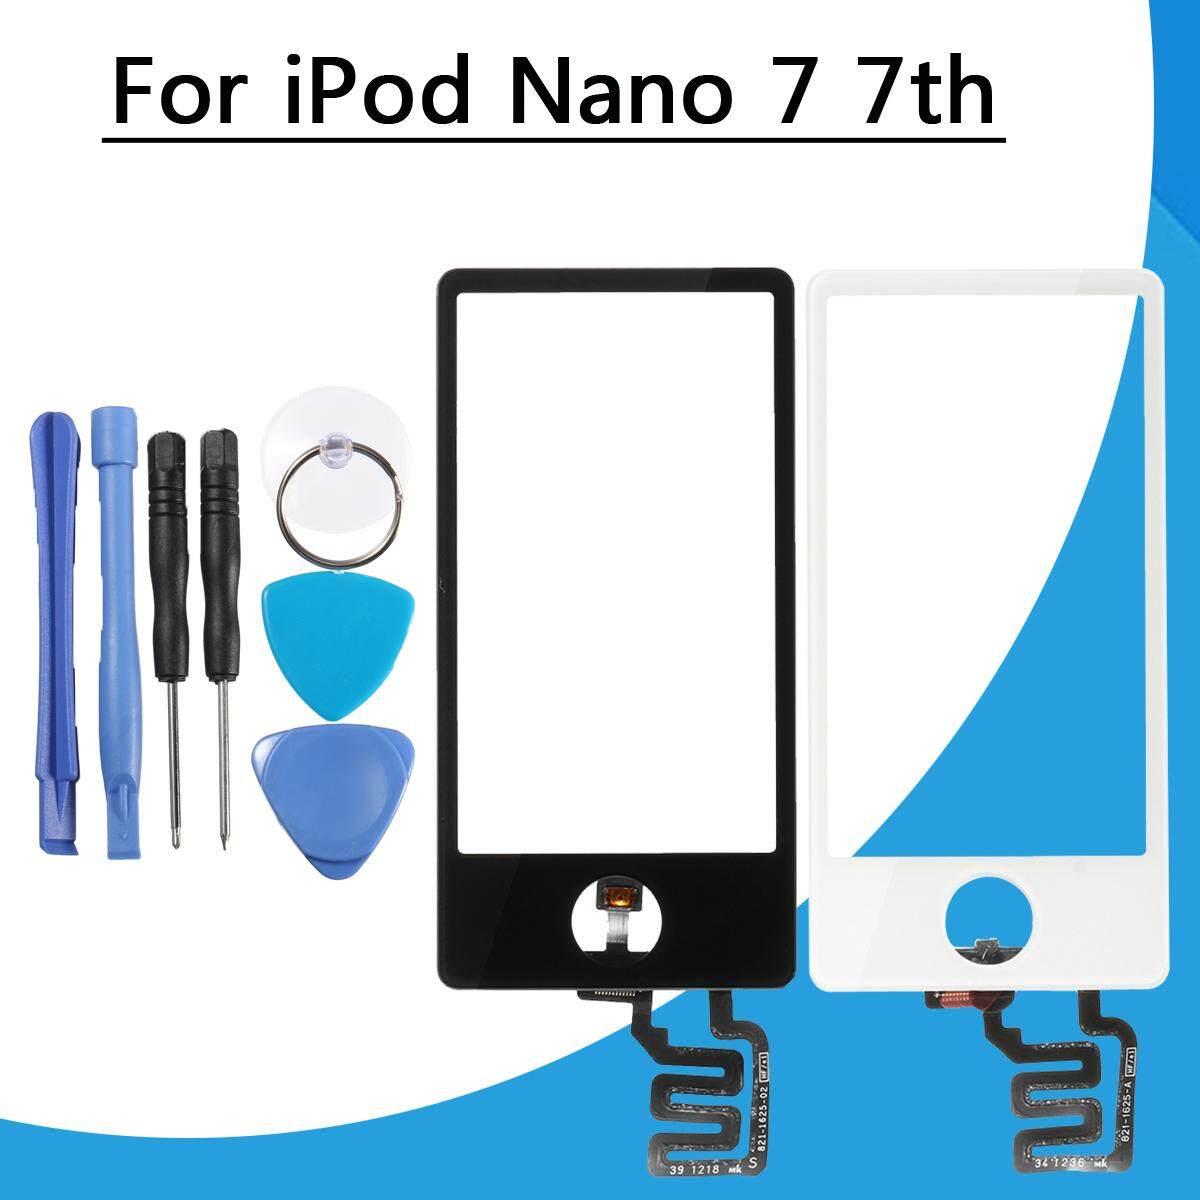 Kami Layar Sentuh Kaca Len Digitizer Ganti Bagian + Alat untuk IPod Nano 7 7th Putih-Internasional